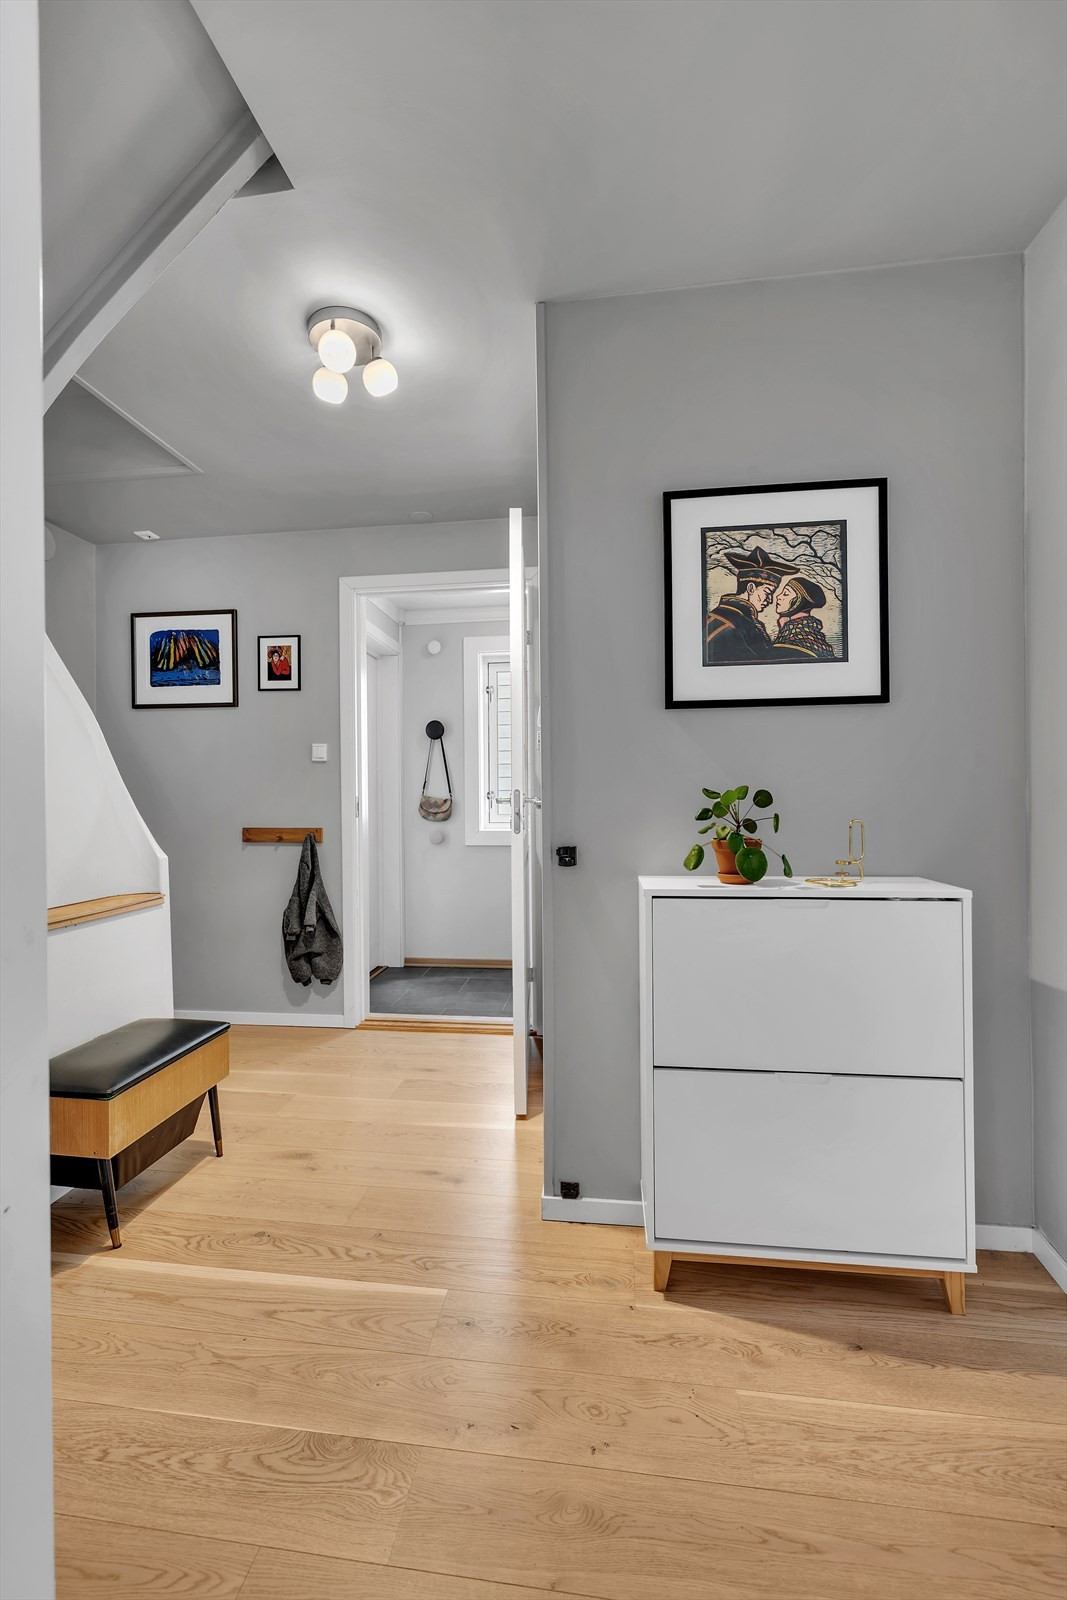 Inngangspartiet leder til denne gangen som forgreiner seg til trappegang, wc, kjøkken og stue